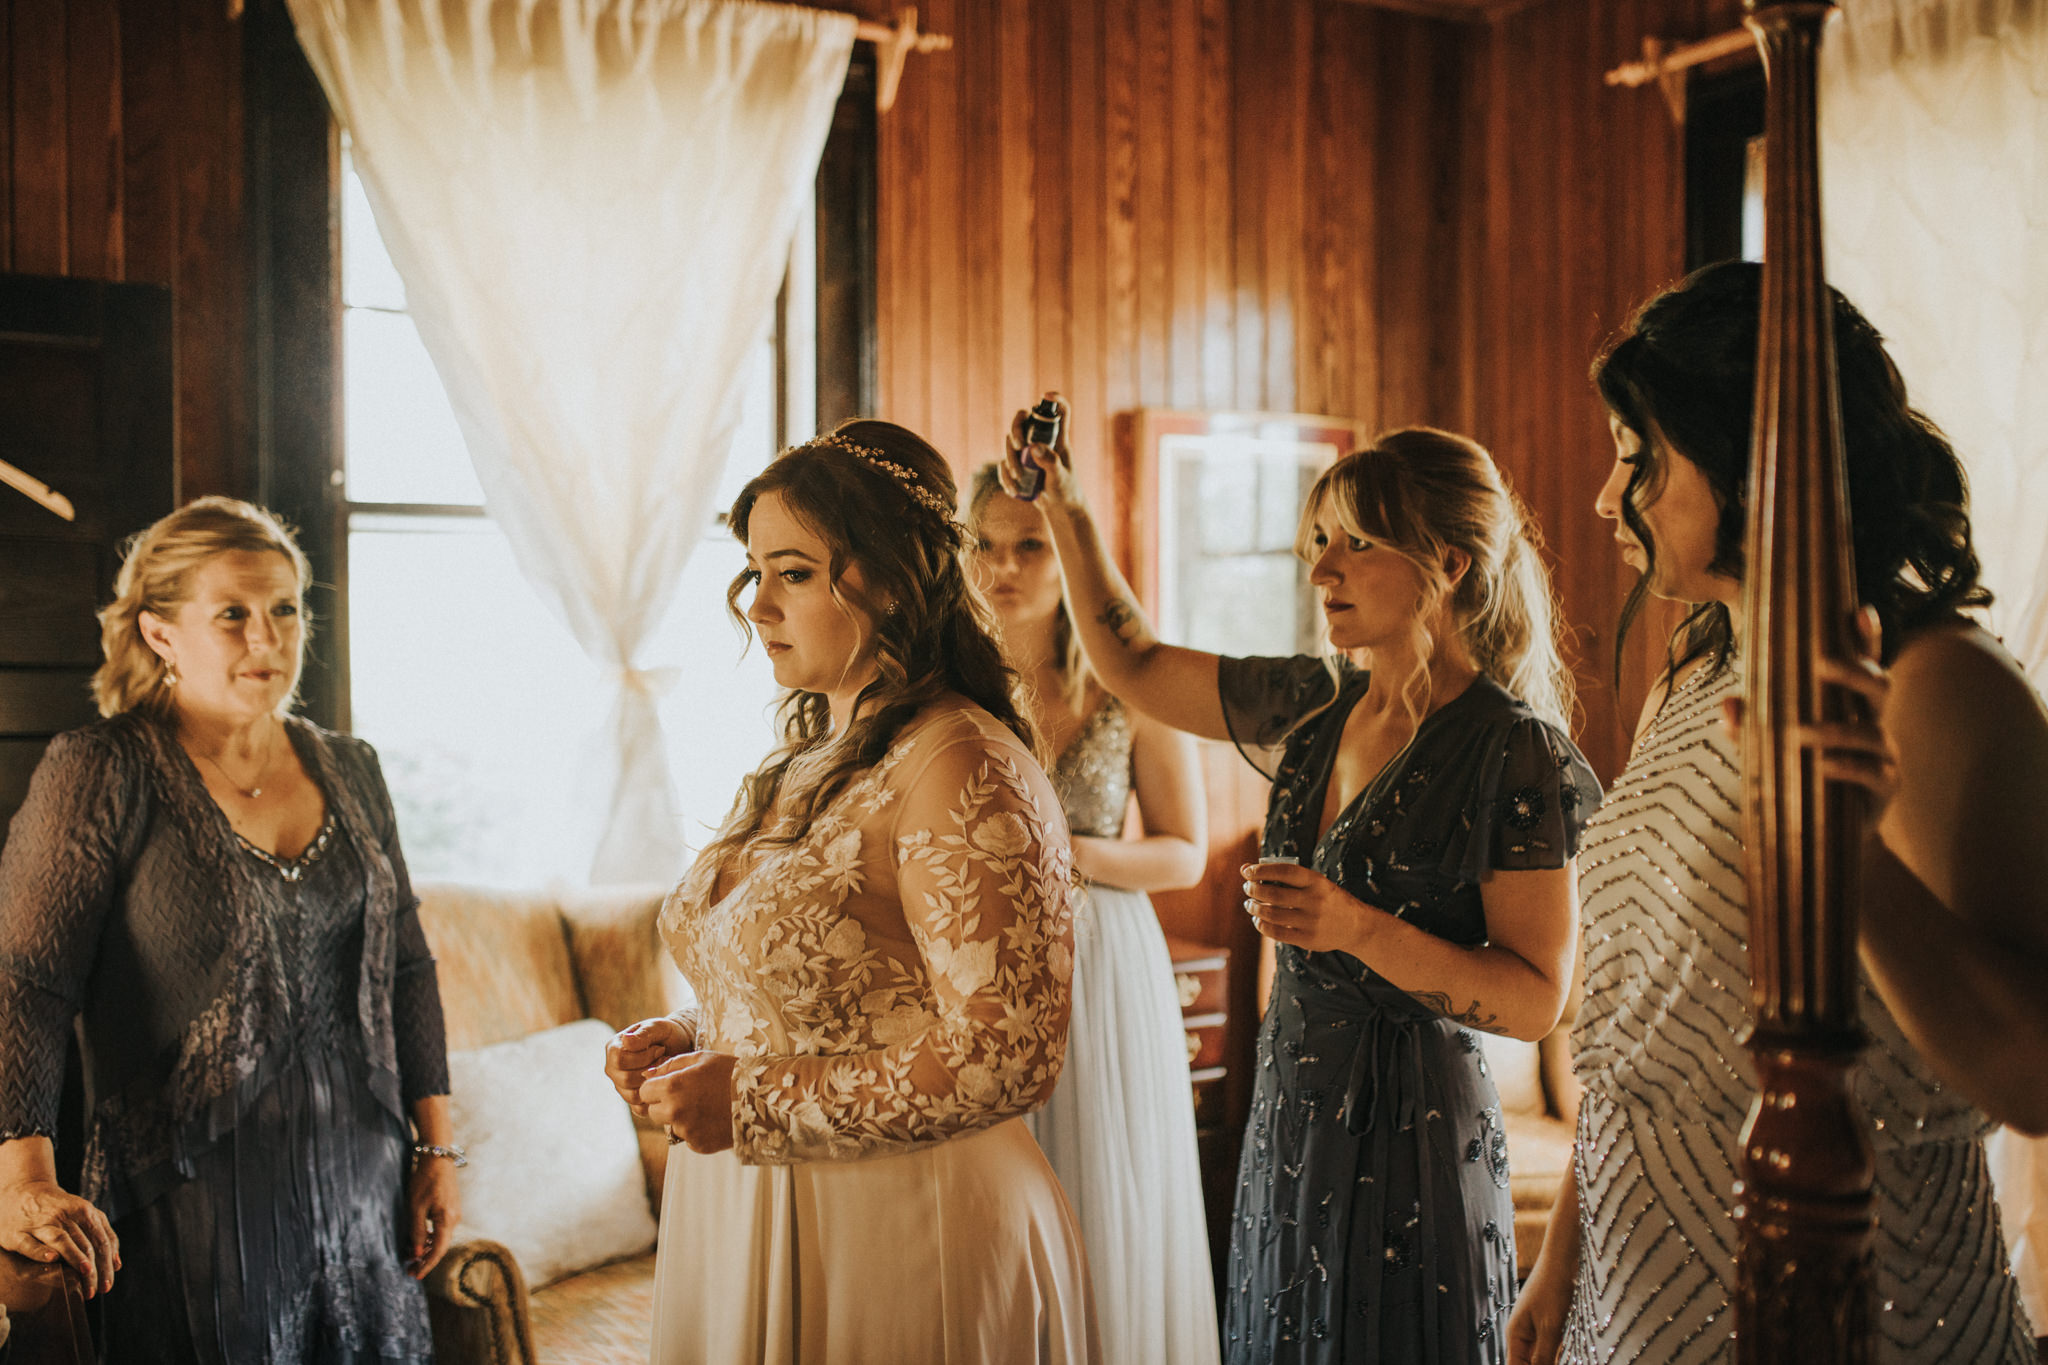 KateMatt-North-Georgia-Wedding-Photographer-Mountain-Laurel-Farm-37.jpg